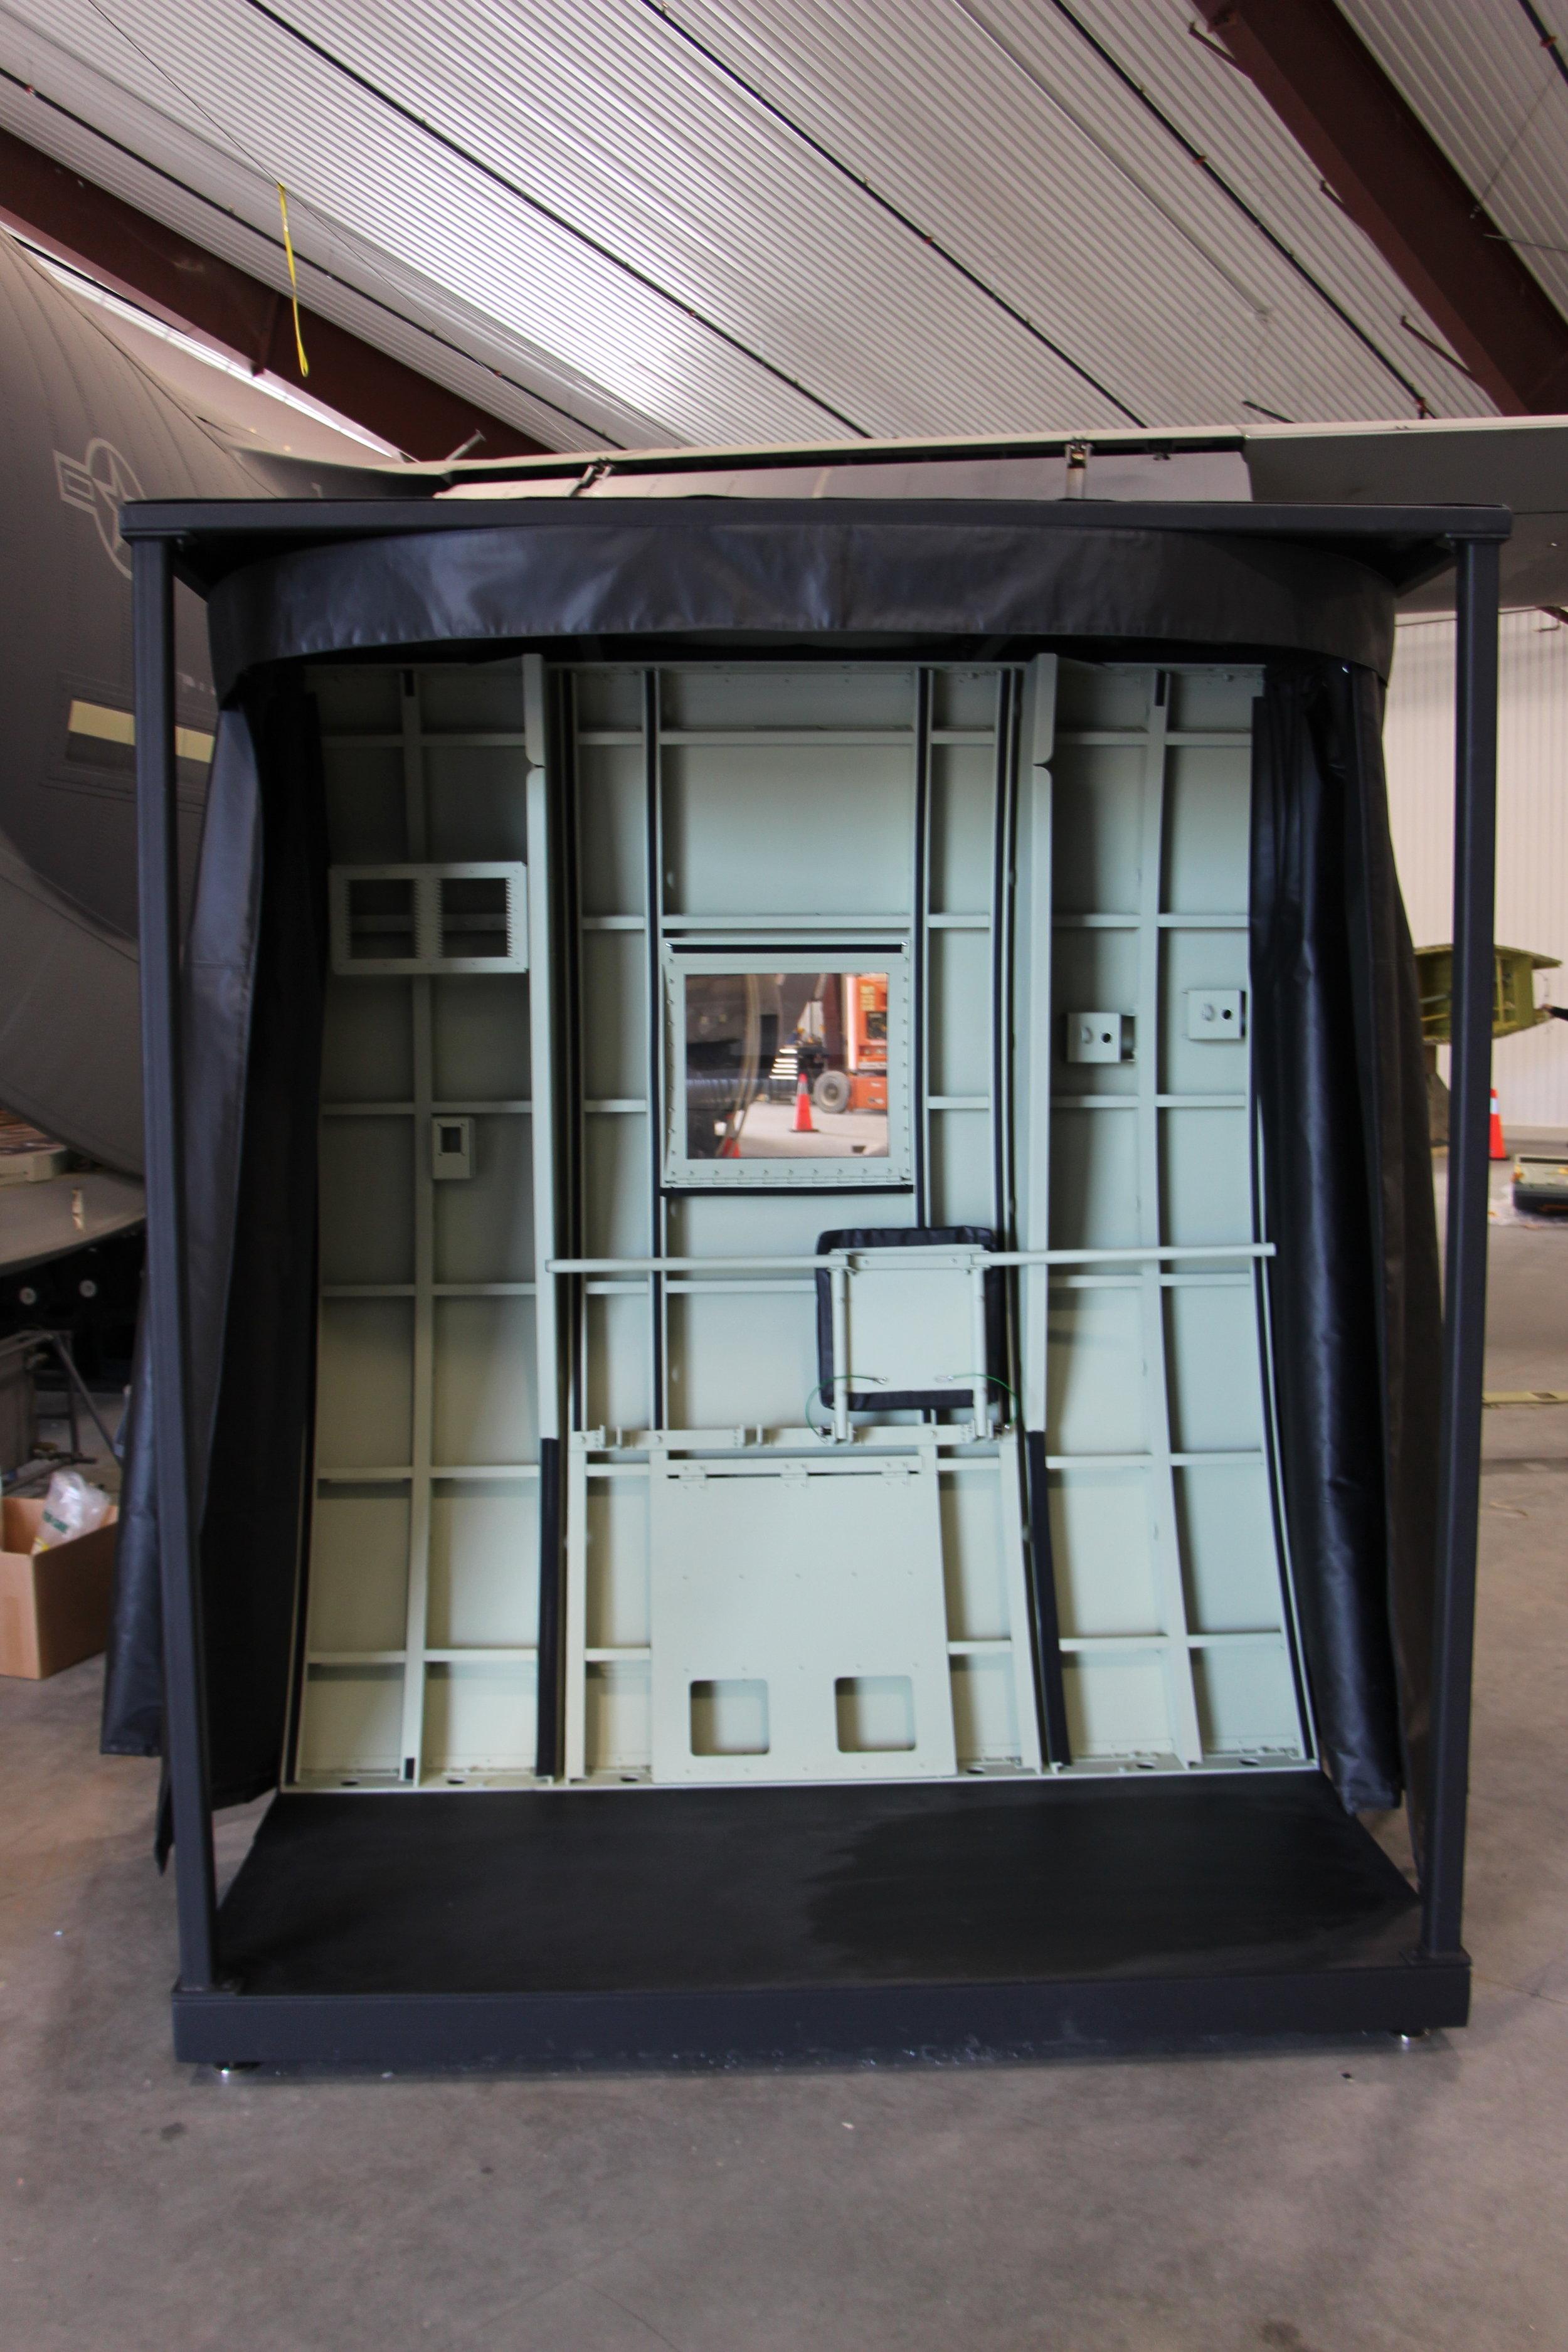 KC-130 Observer Training Aid (OTA)